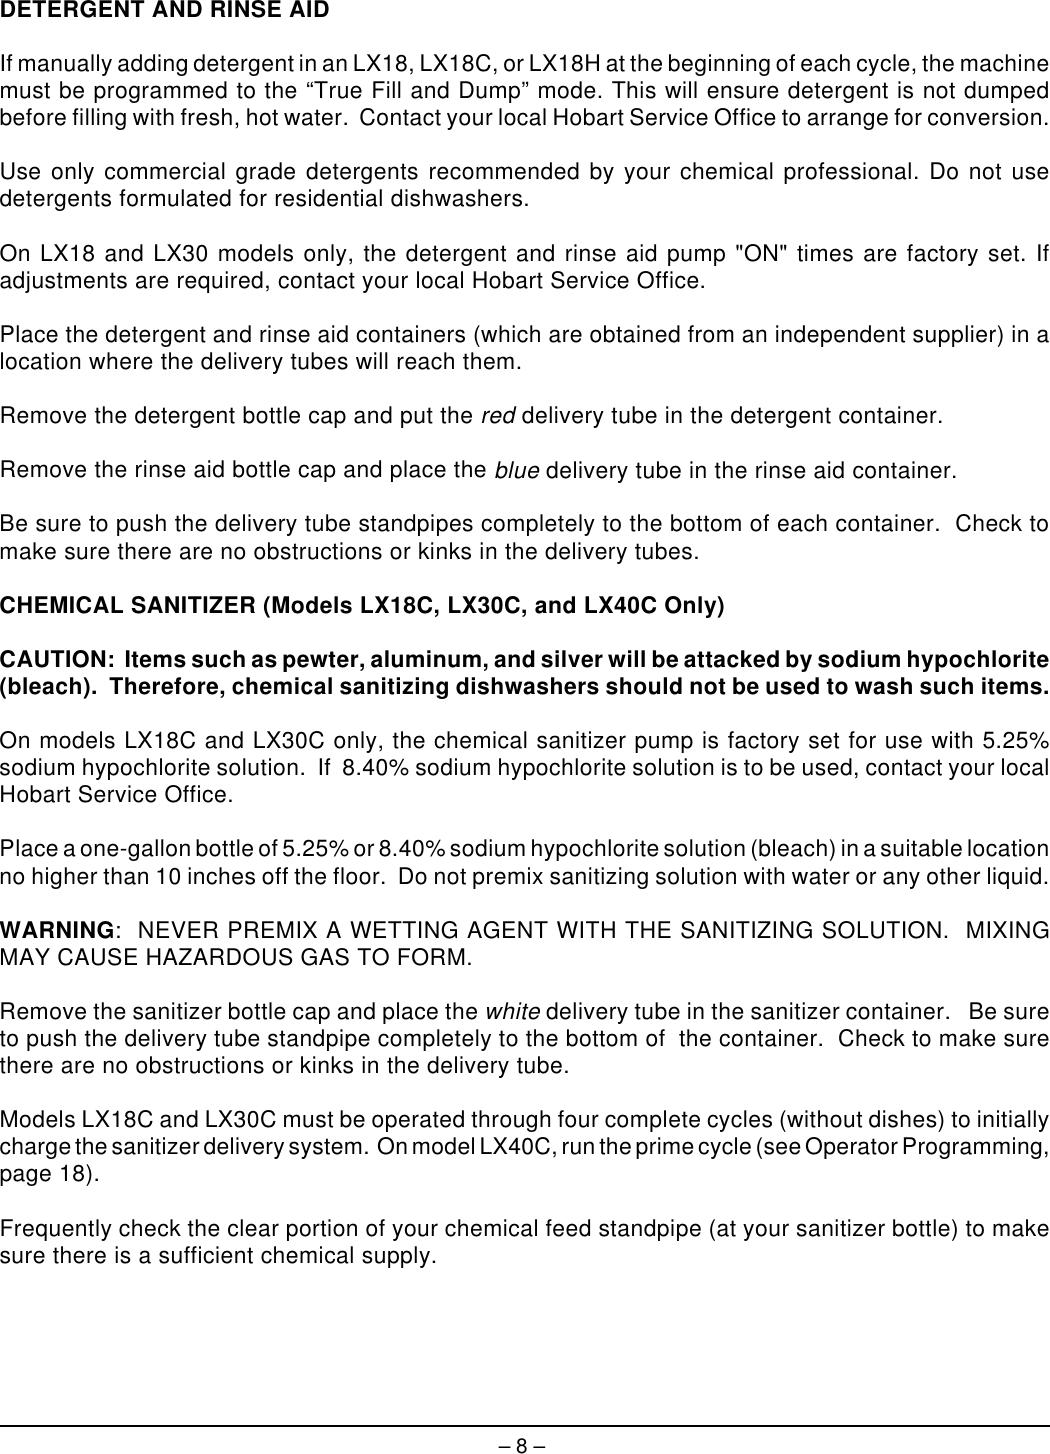 Hobart Lx18 Instruction Manual ManualsLib Makes It Easy To